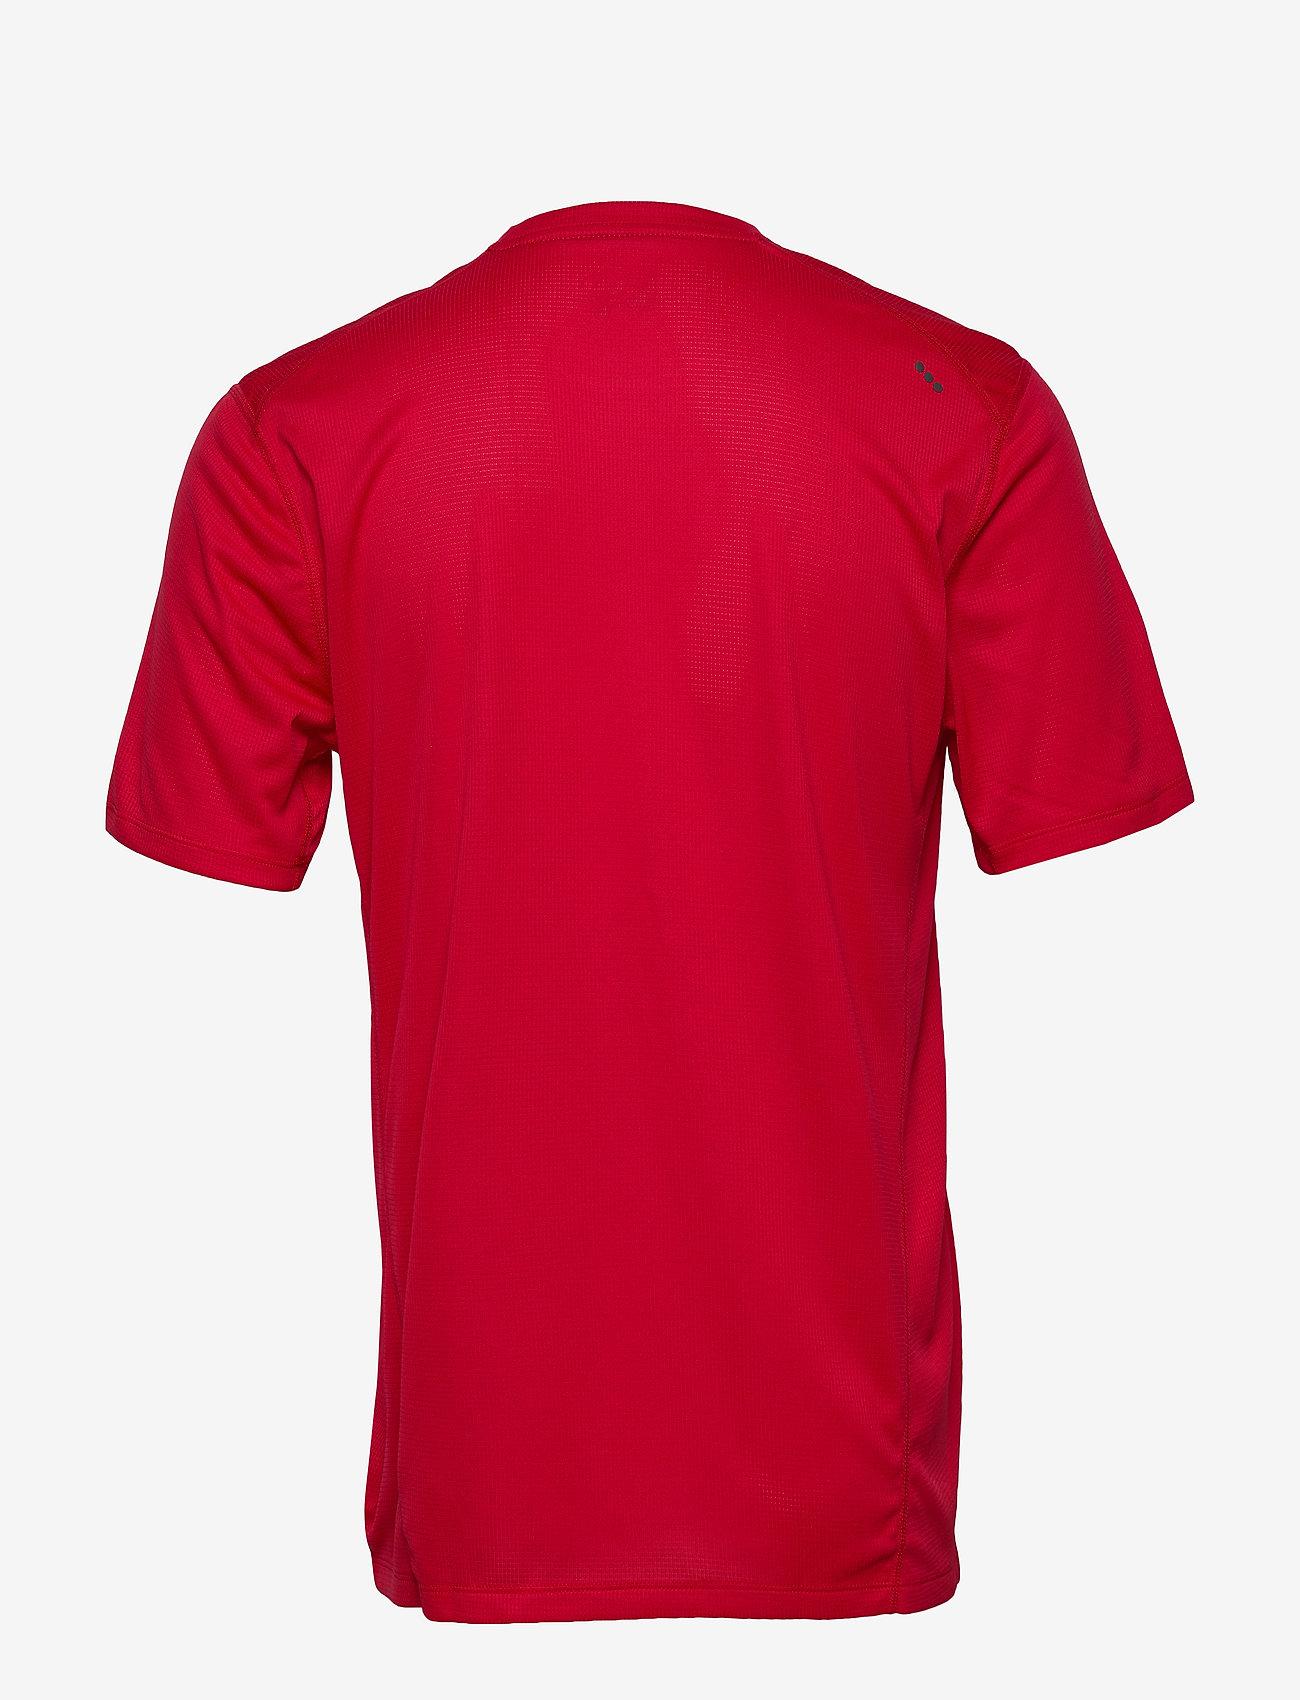 Stopwatch Short Sleeve (Saucony Red) (20.93 €) - Saucony goFcB